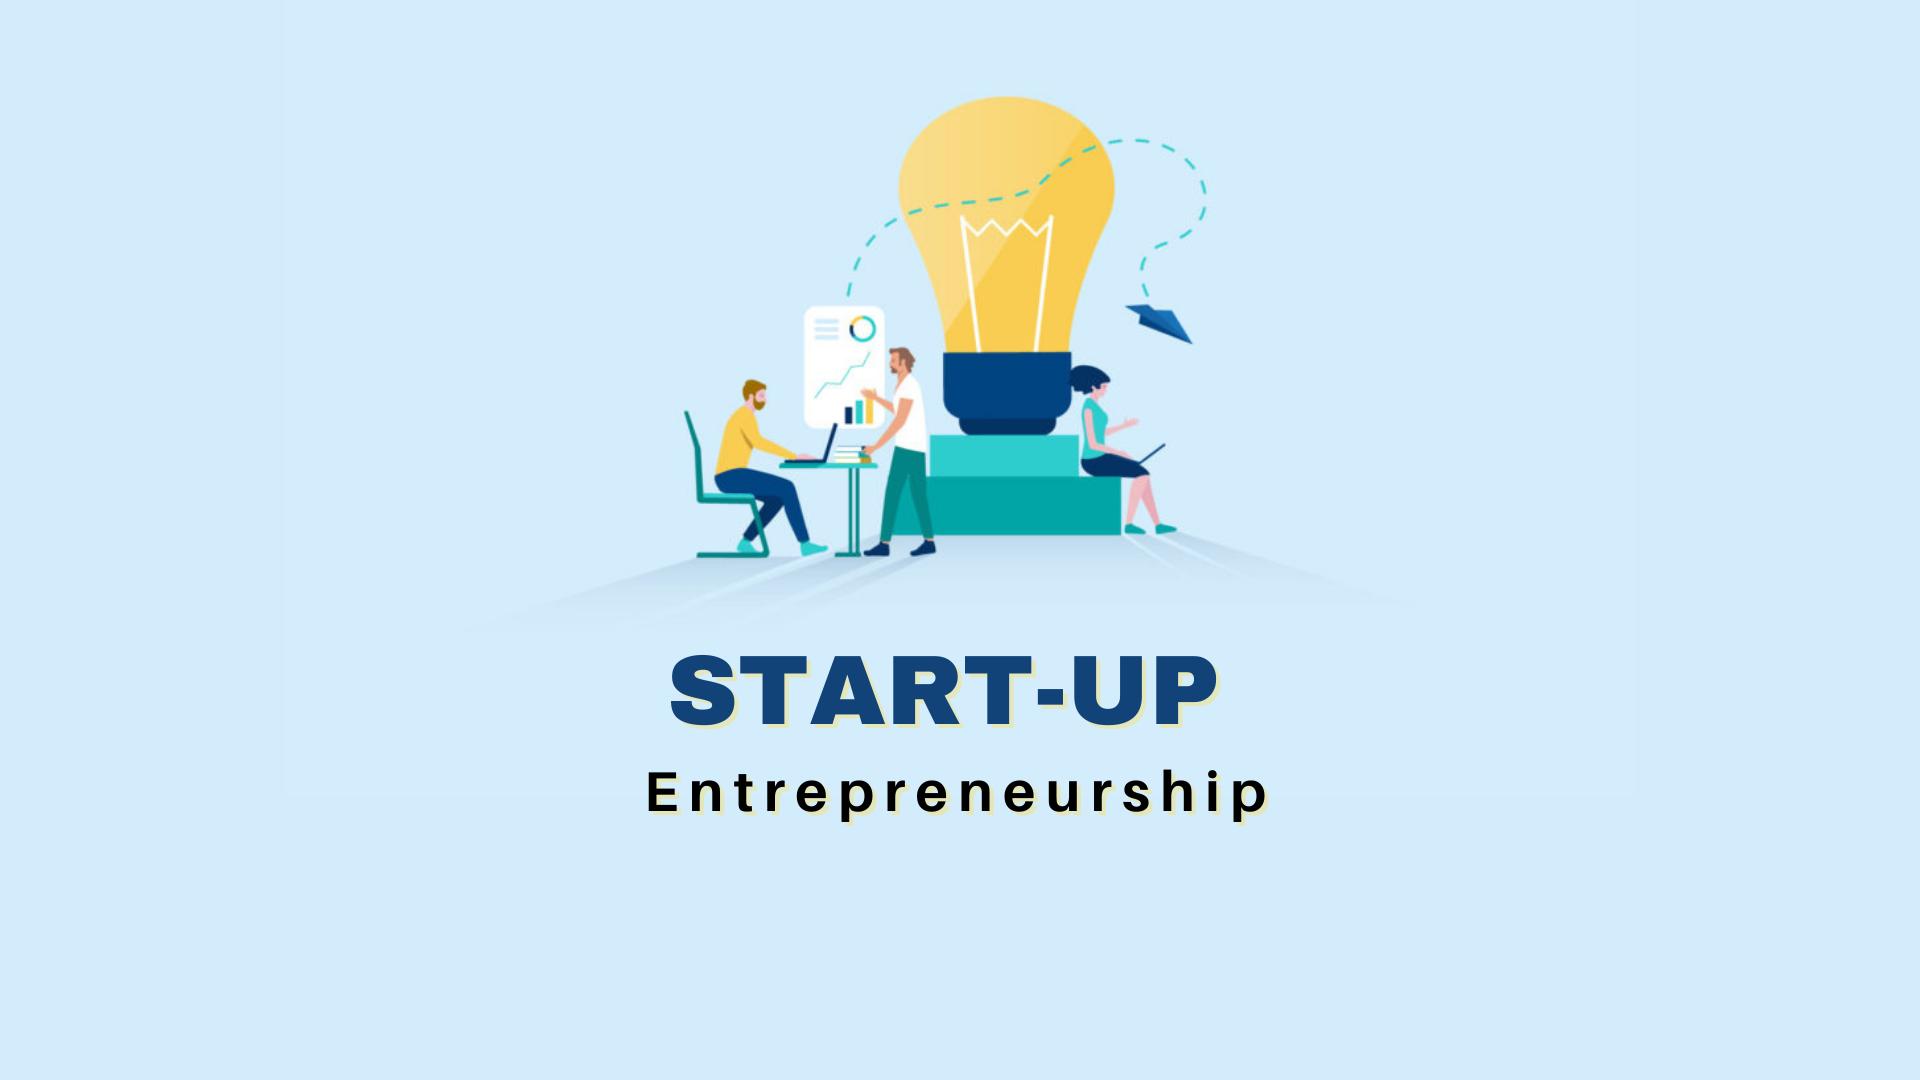 Start-up Entrepreneurship course image